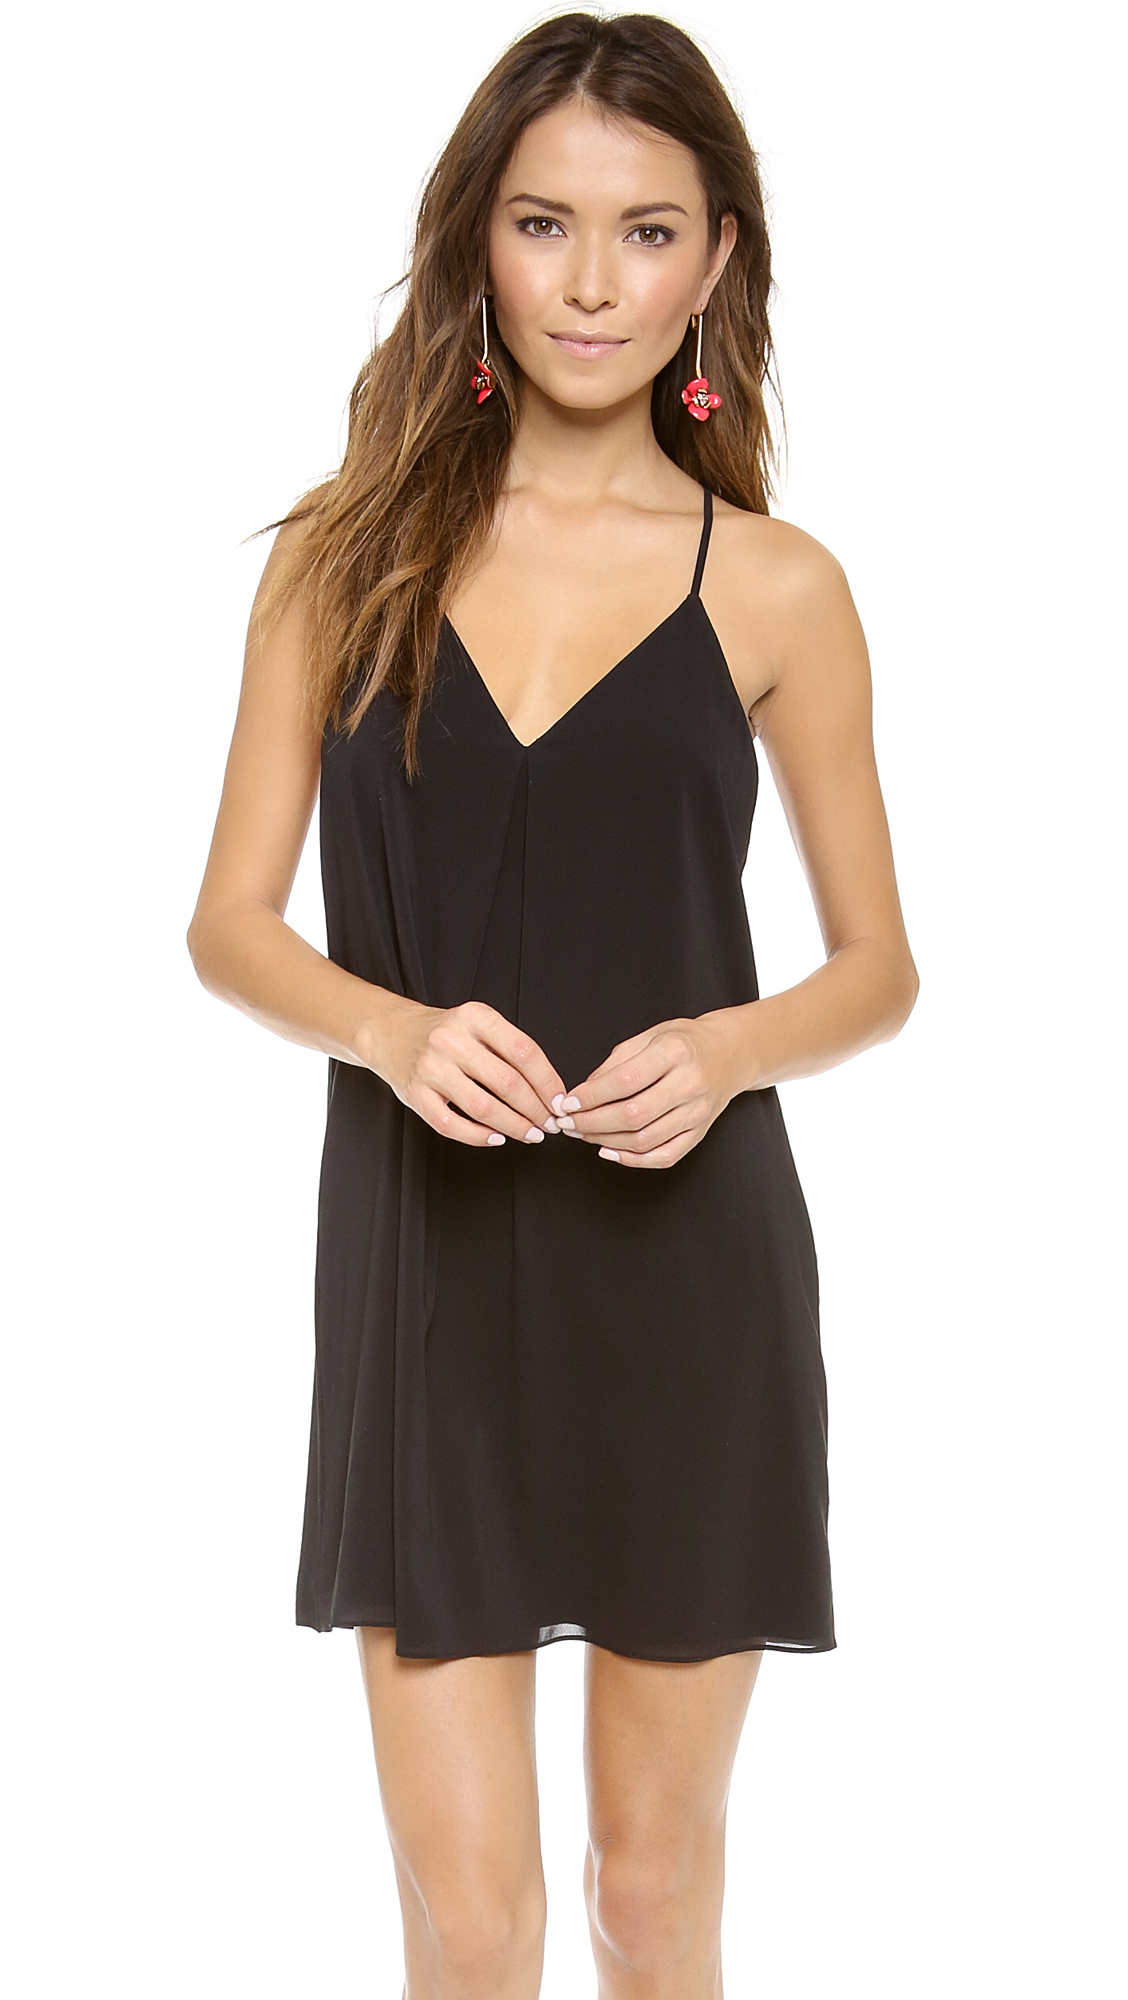 Alice + Olivia Fierra Dress - Black at Shopbop